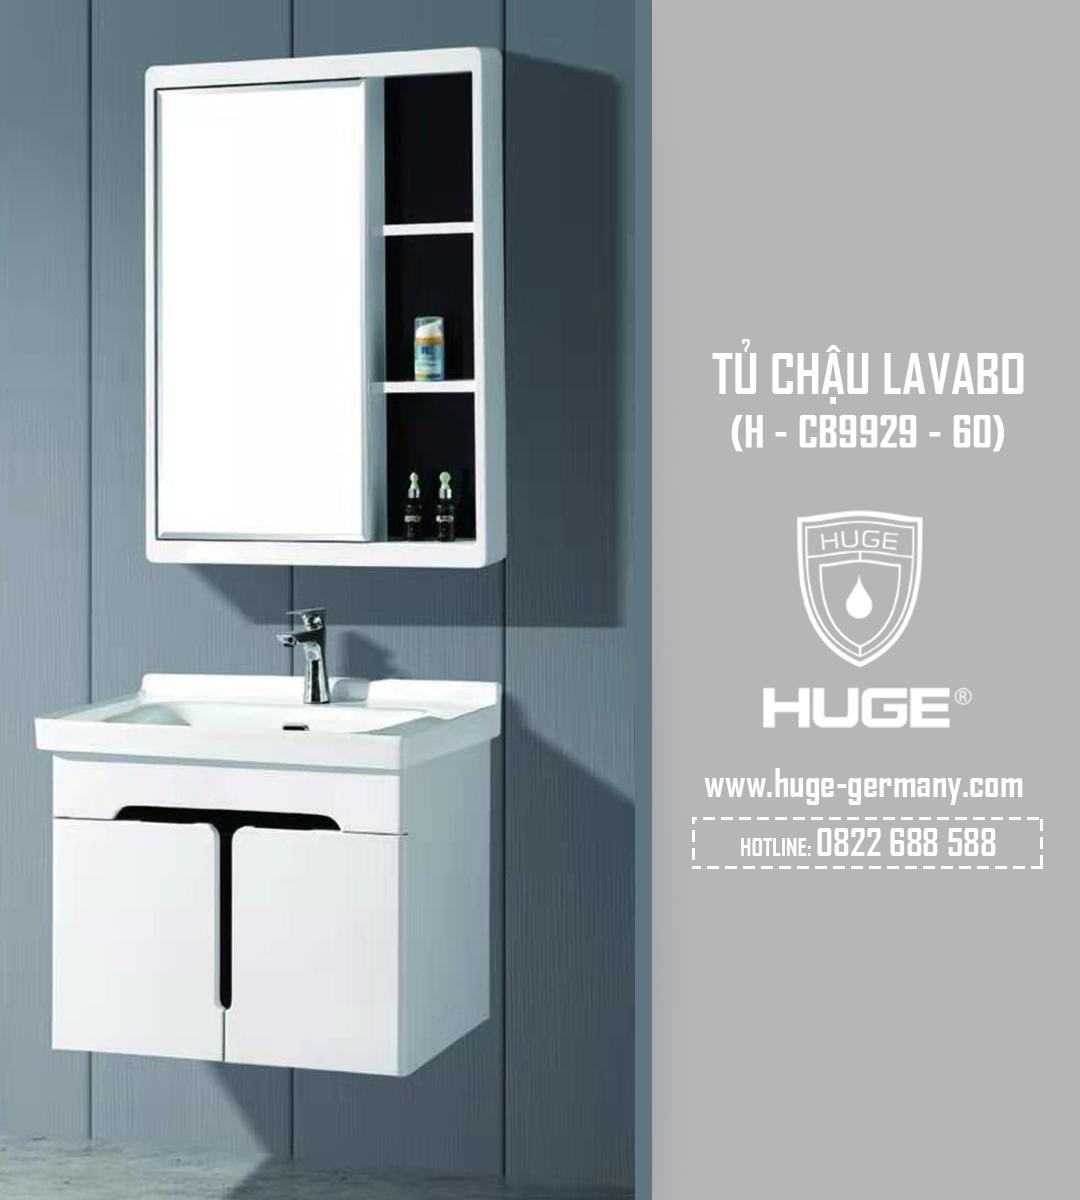 Tủ chậu Lavabo 600 (H-CB9929-60)